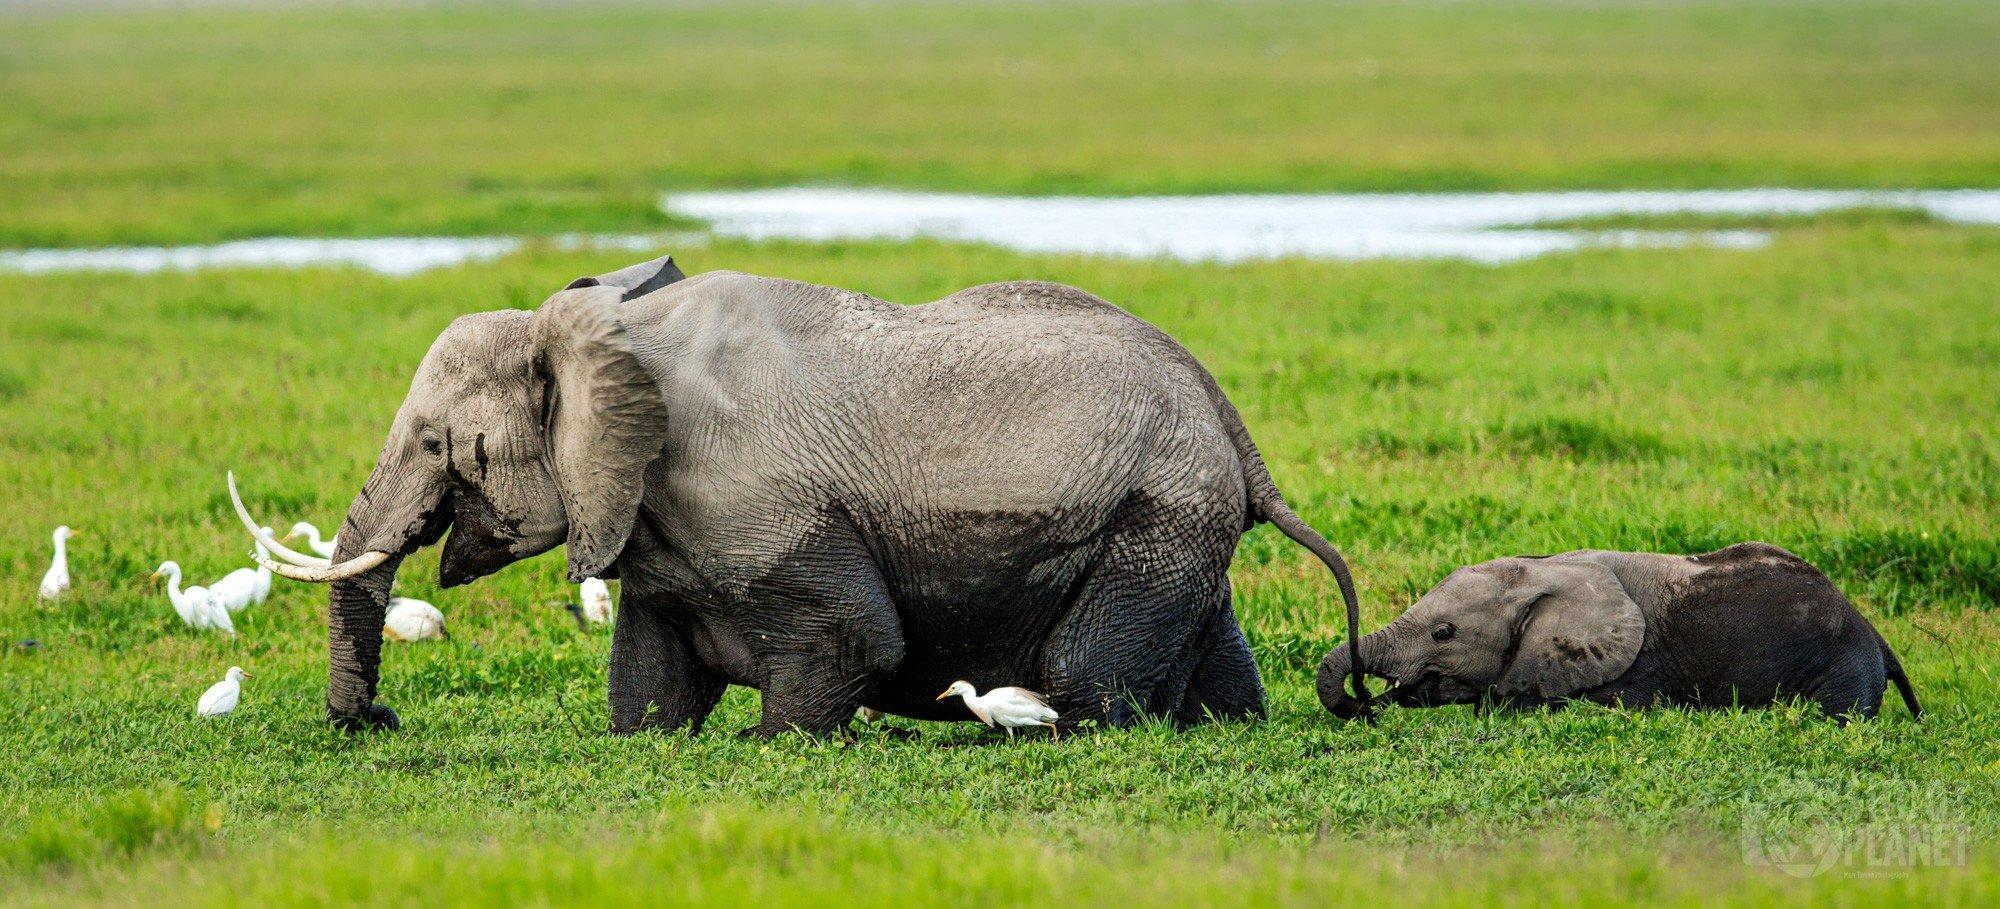 Mother and calf elephants Amboseli park Kenya